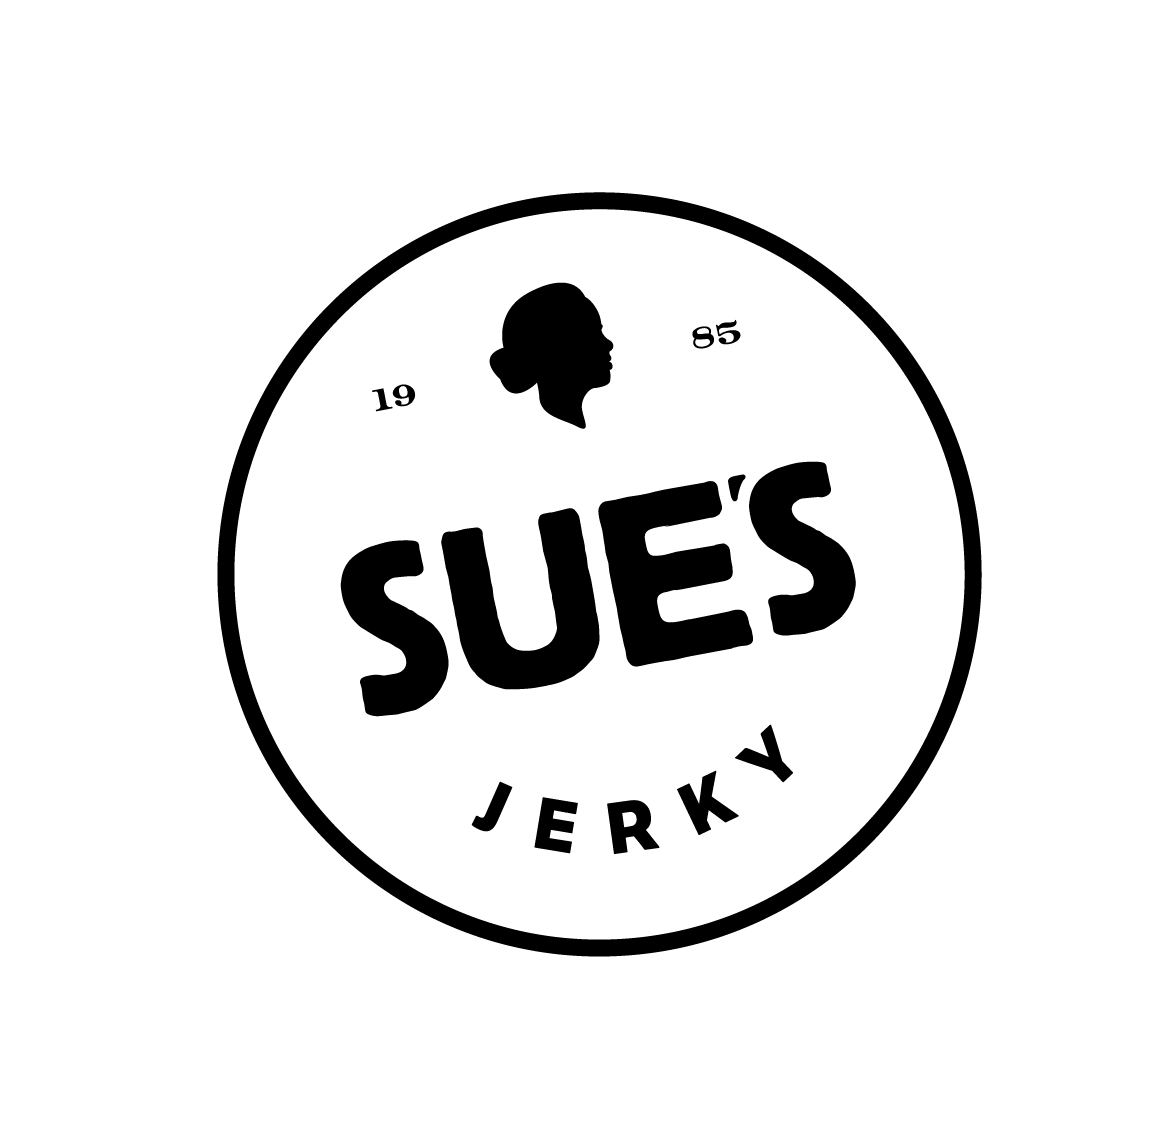 sues Logo photo - 1